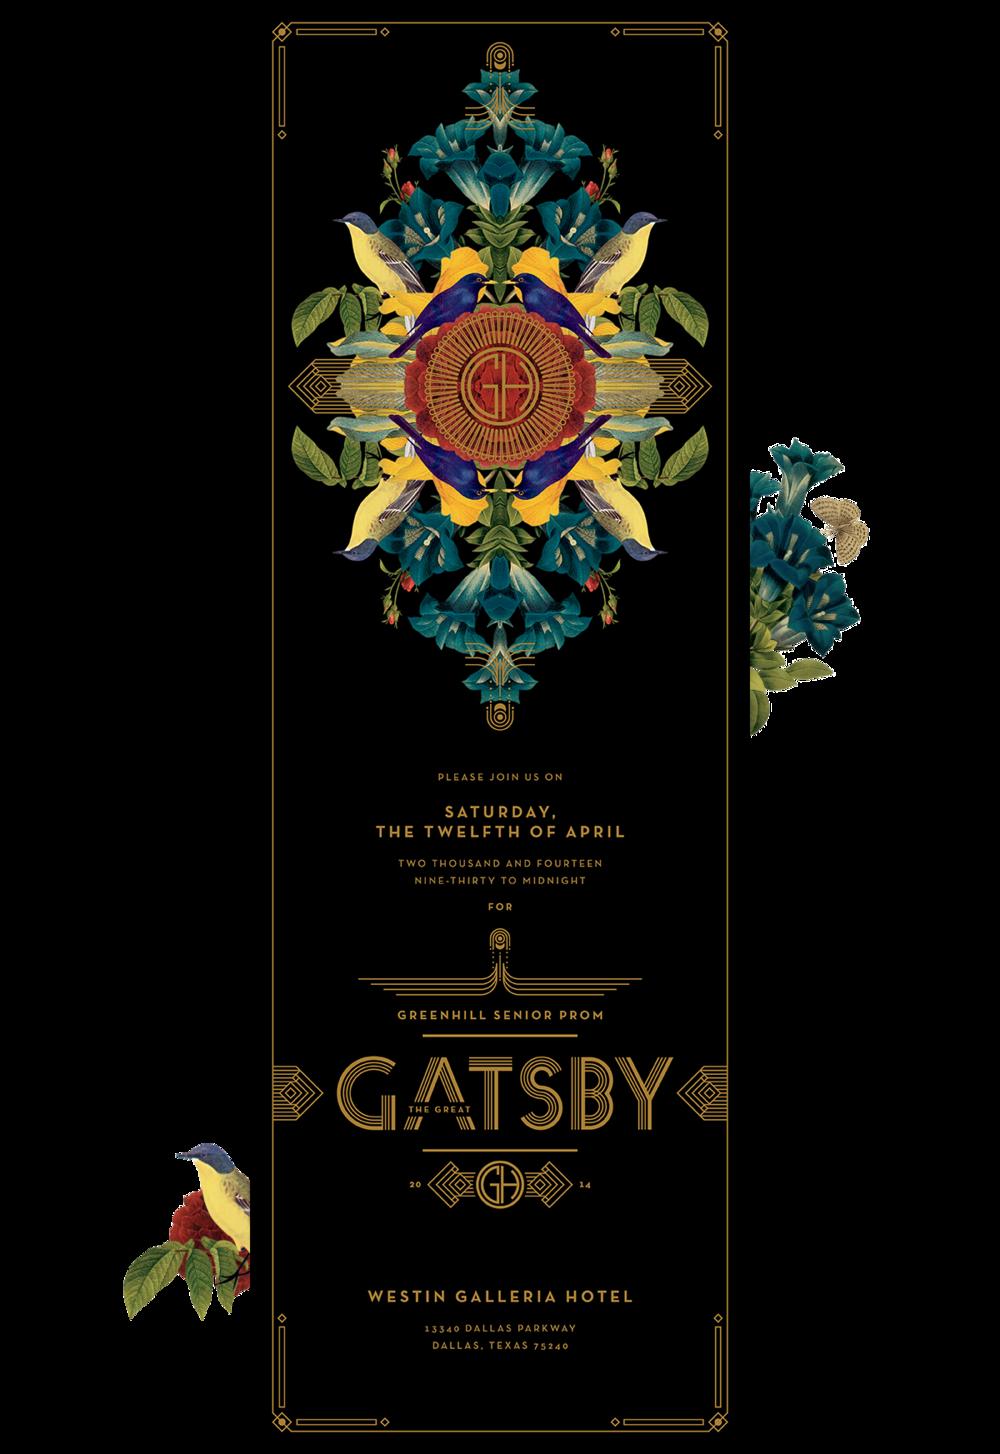 Rachel_Negahban_Gatsby_Invitation_Event_Branding-12.png